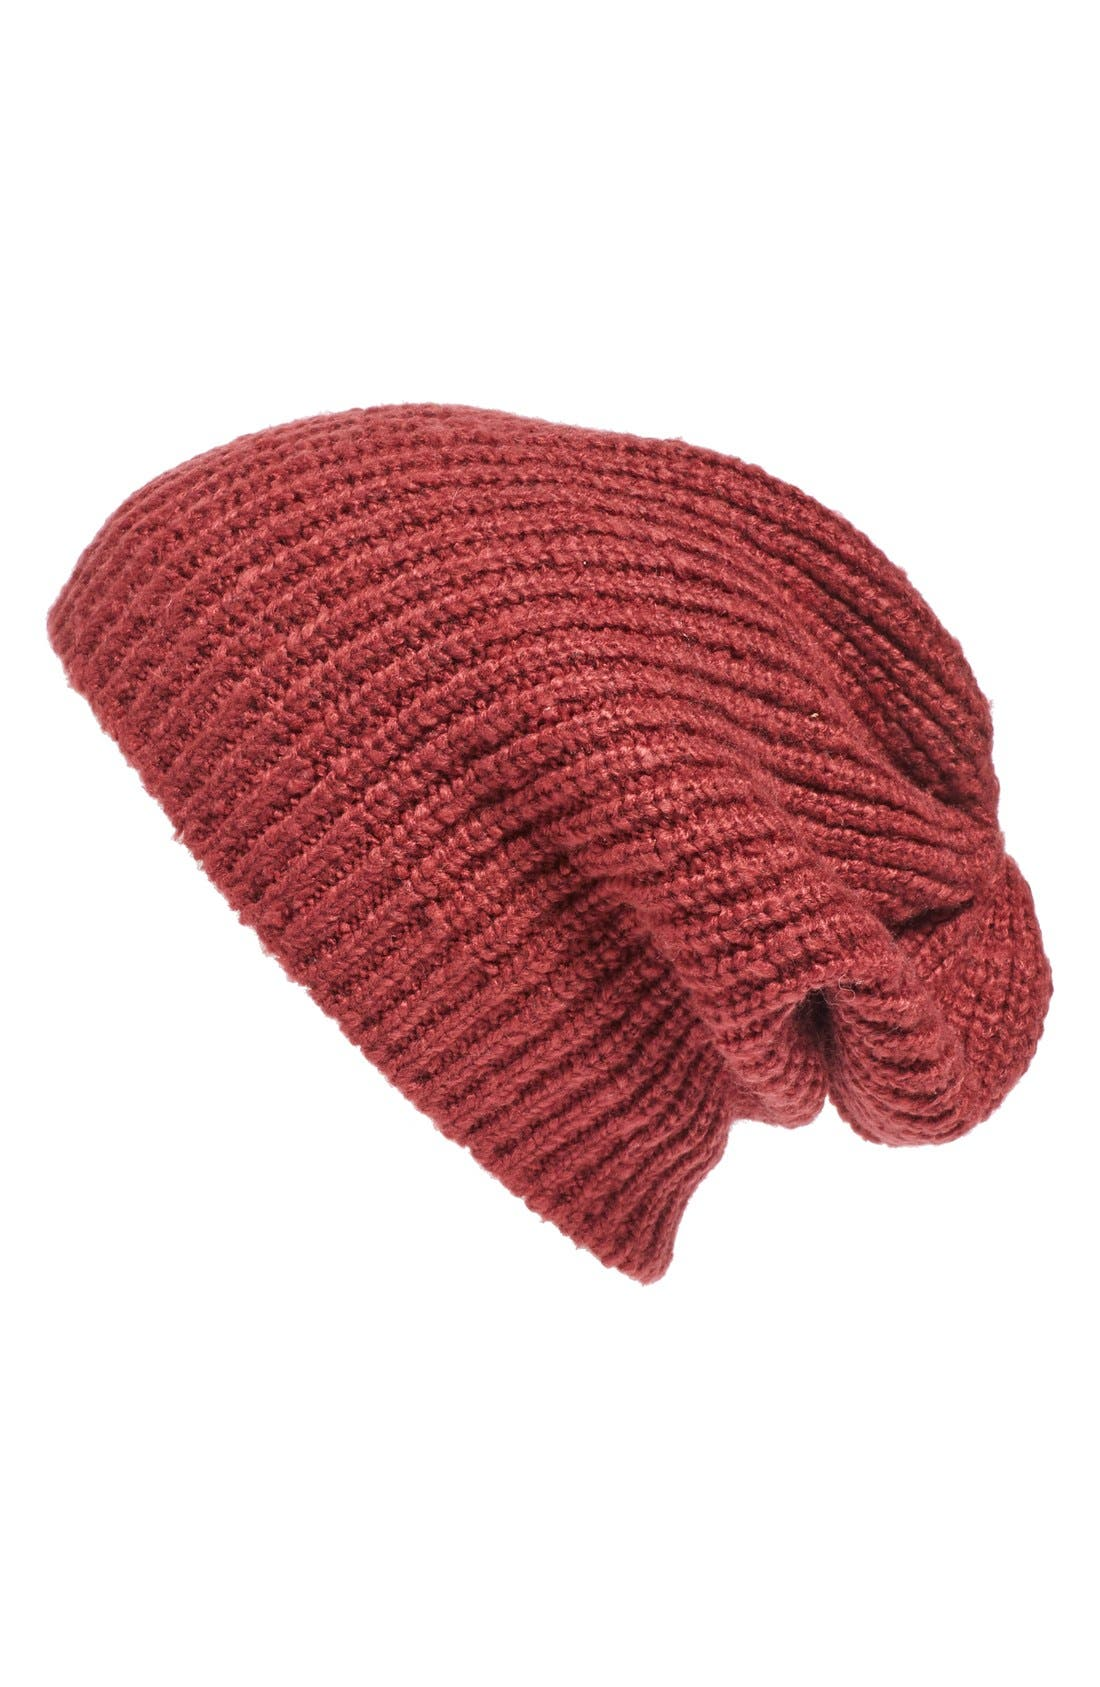 Main Image - Caslon® 'Coordin' Knit Beanie